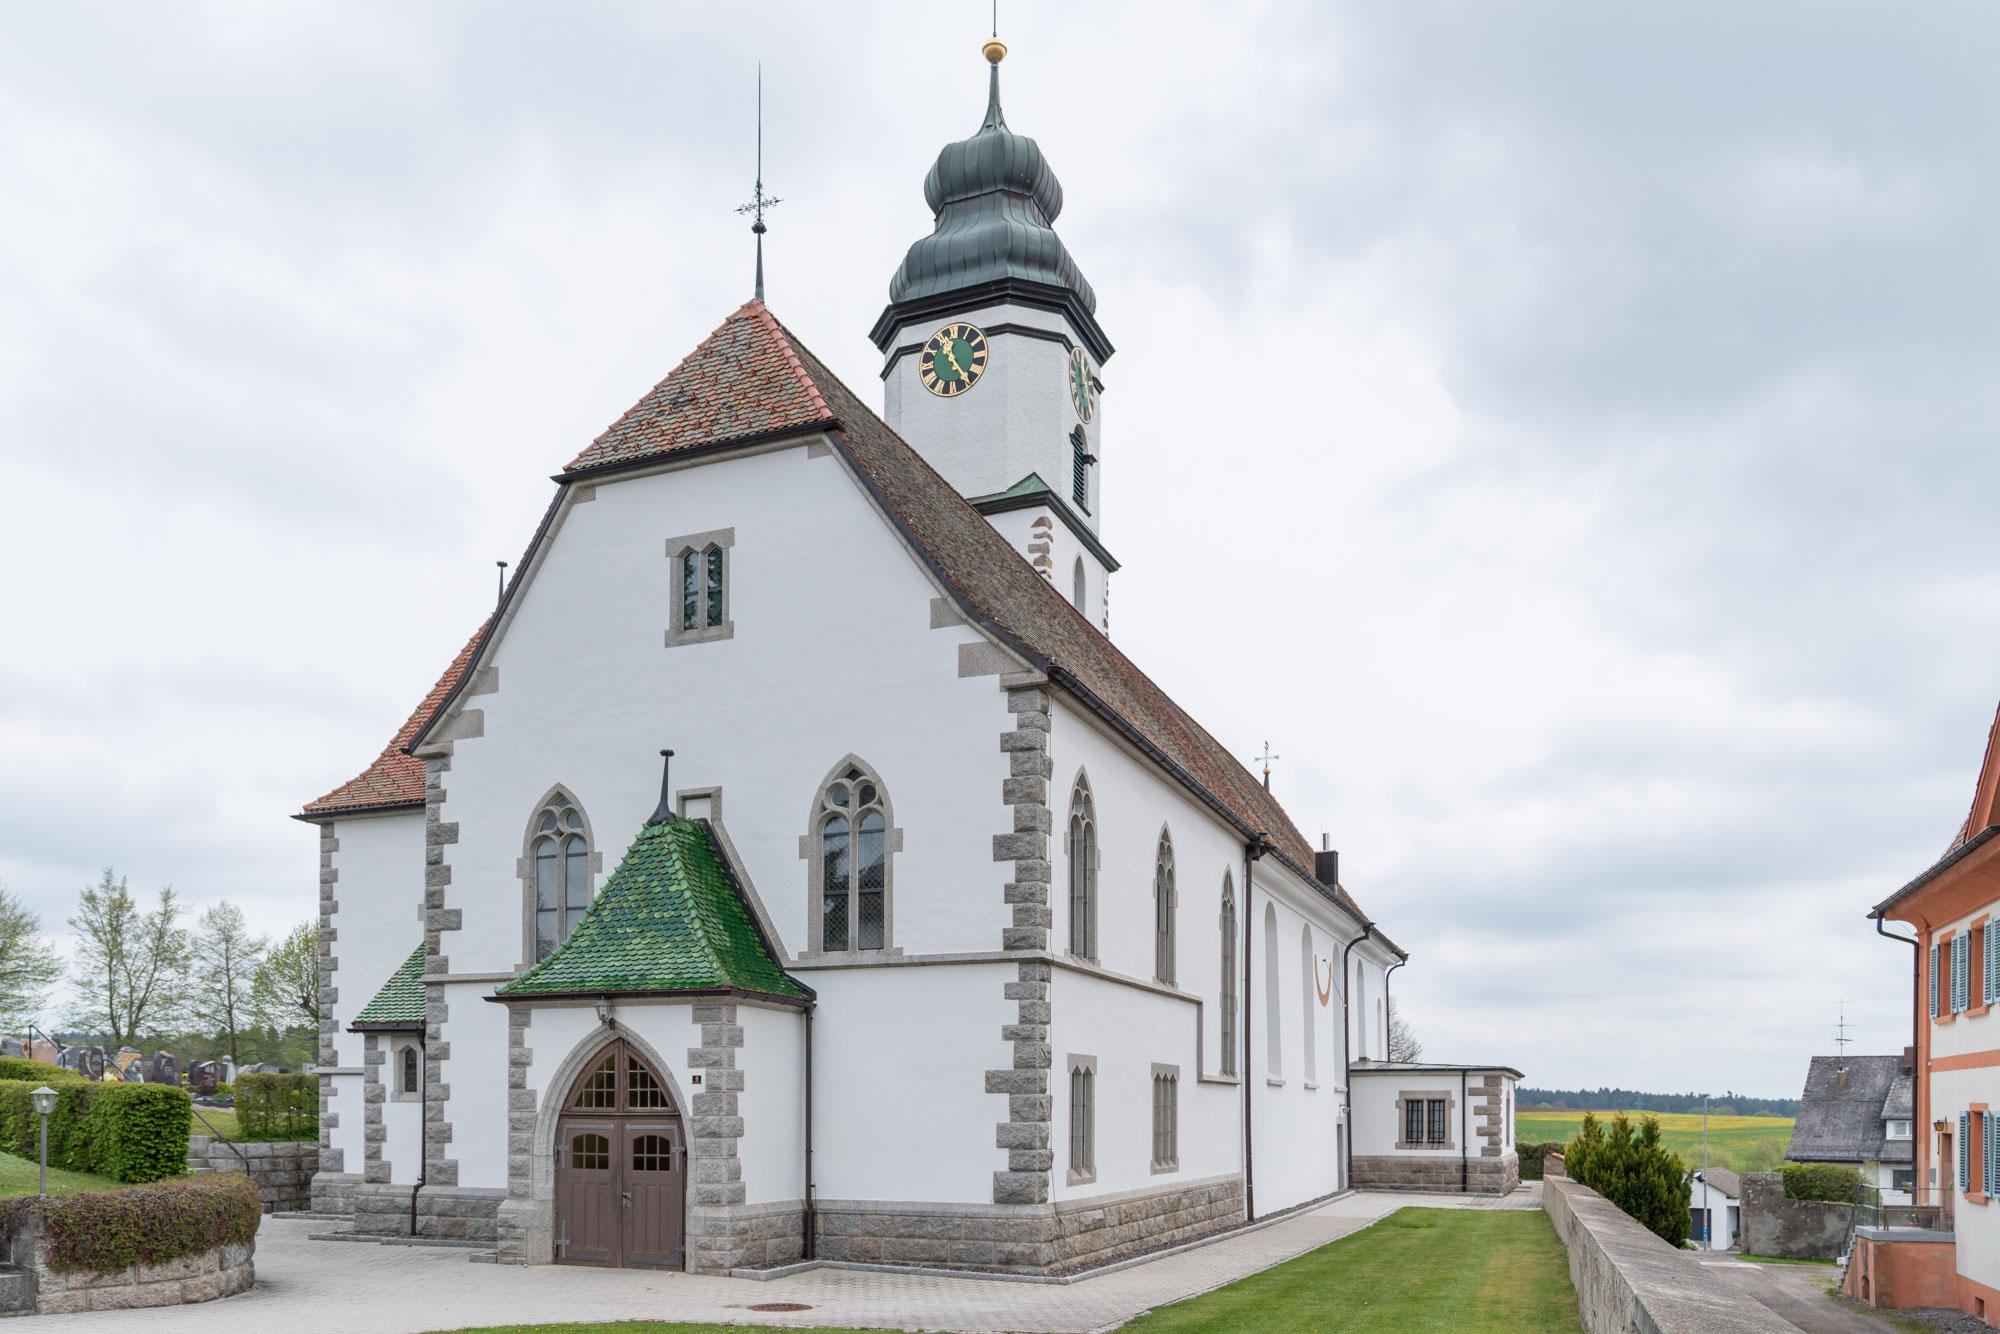 Architekturbüro Kaiser Referenz Pfarrkirche St. Fides